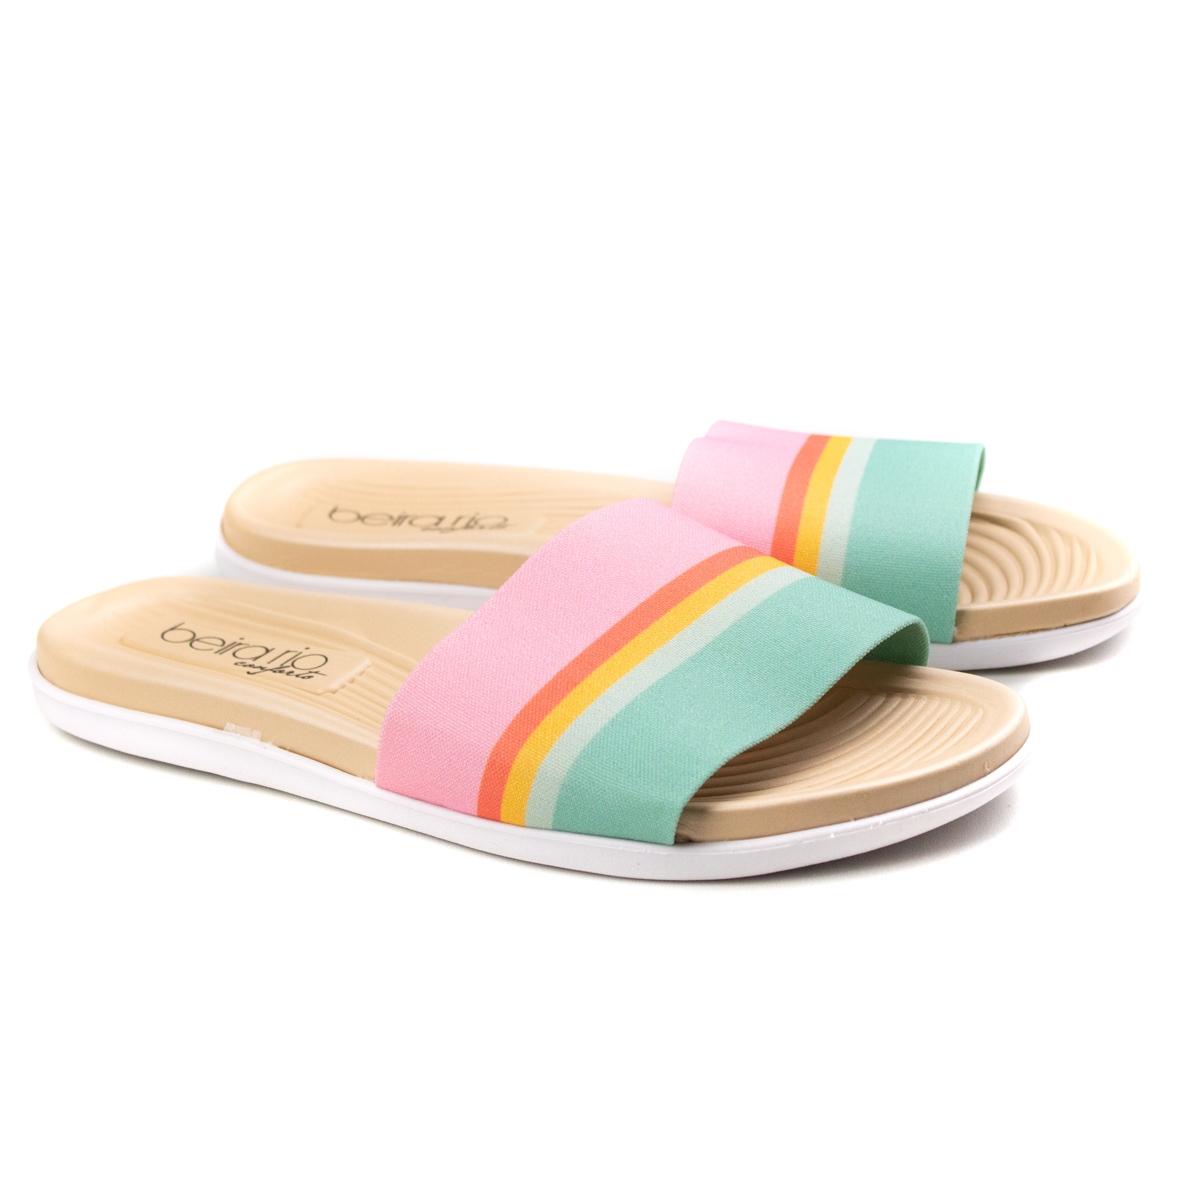 Tamanco Slide Rainbow Feminino Beira Rio - Multi rosa